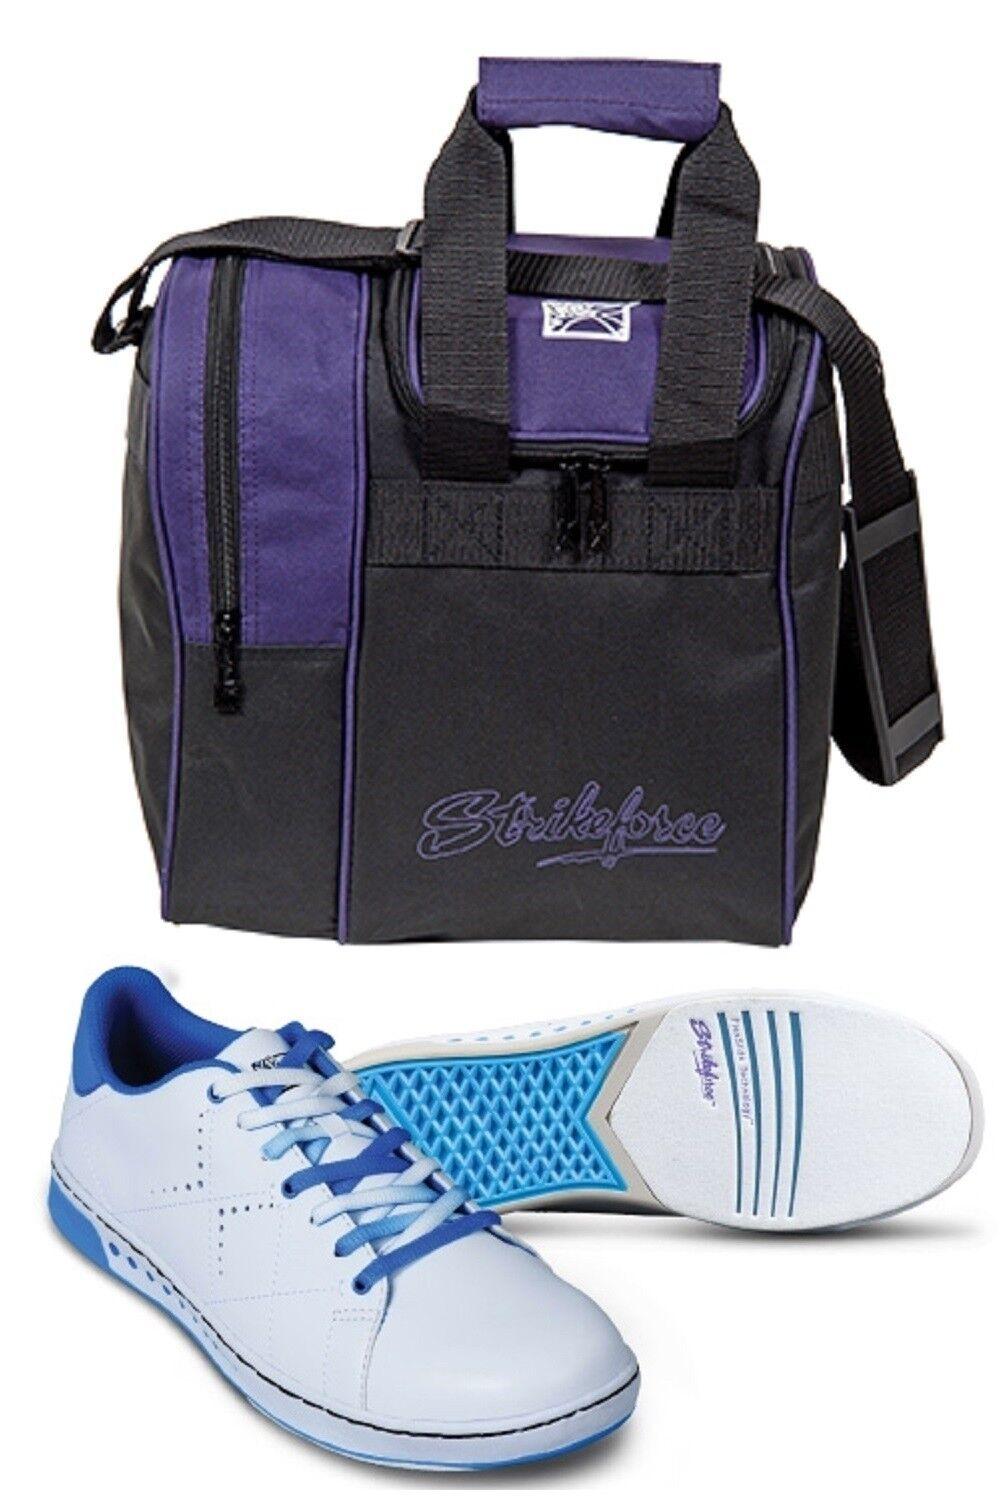 Girls KR Strikeforce GEM Bowling shoes White & bluee Sizes 1-5 & Purpl 1 Ball Bag